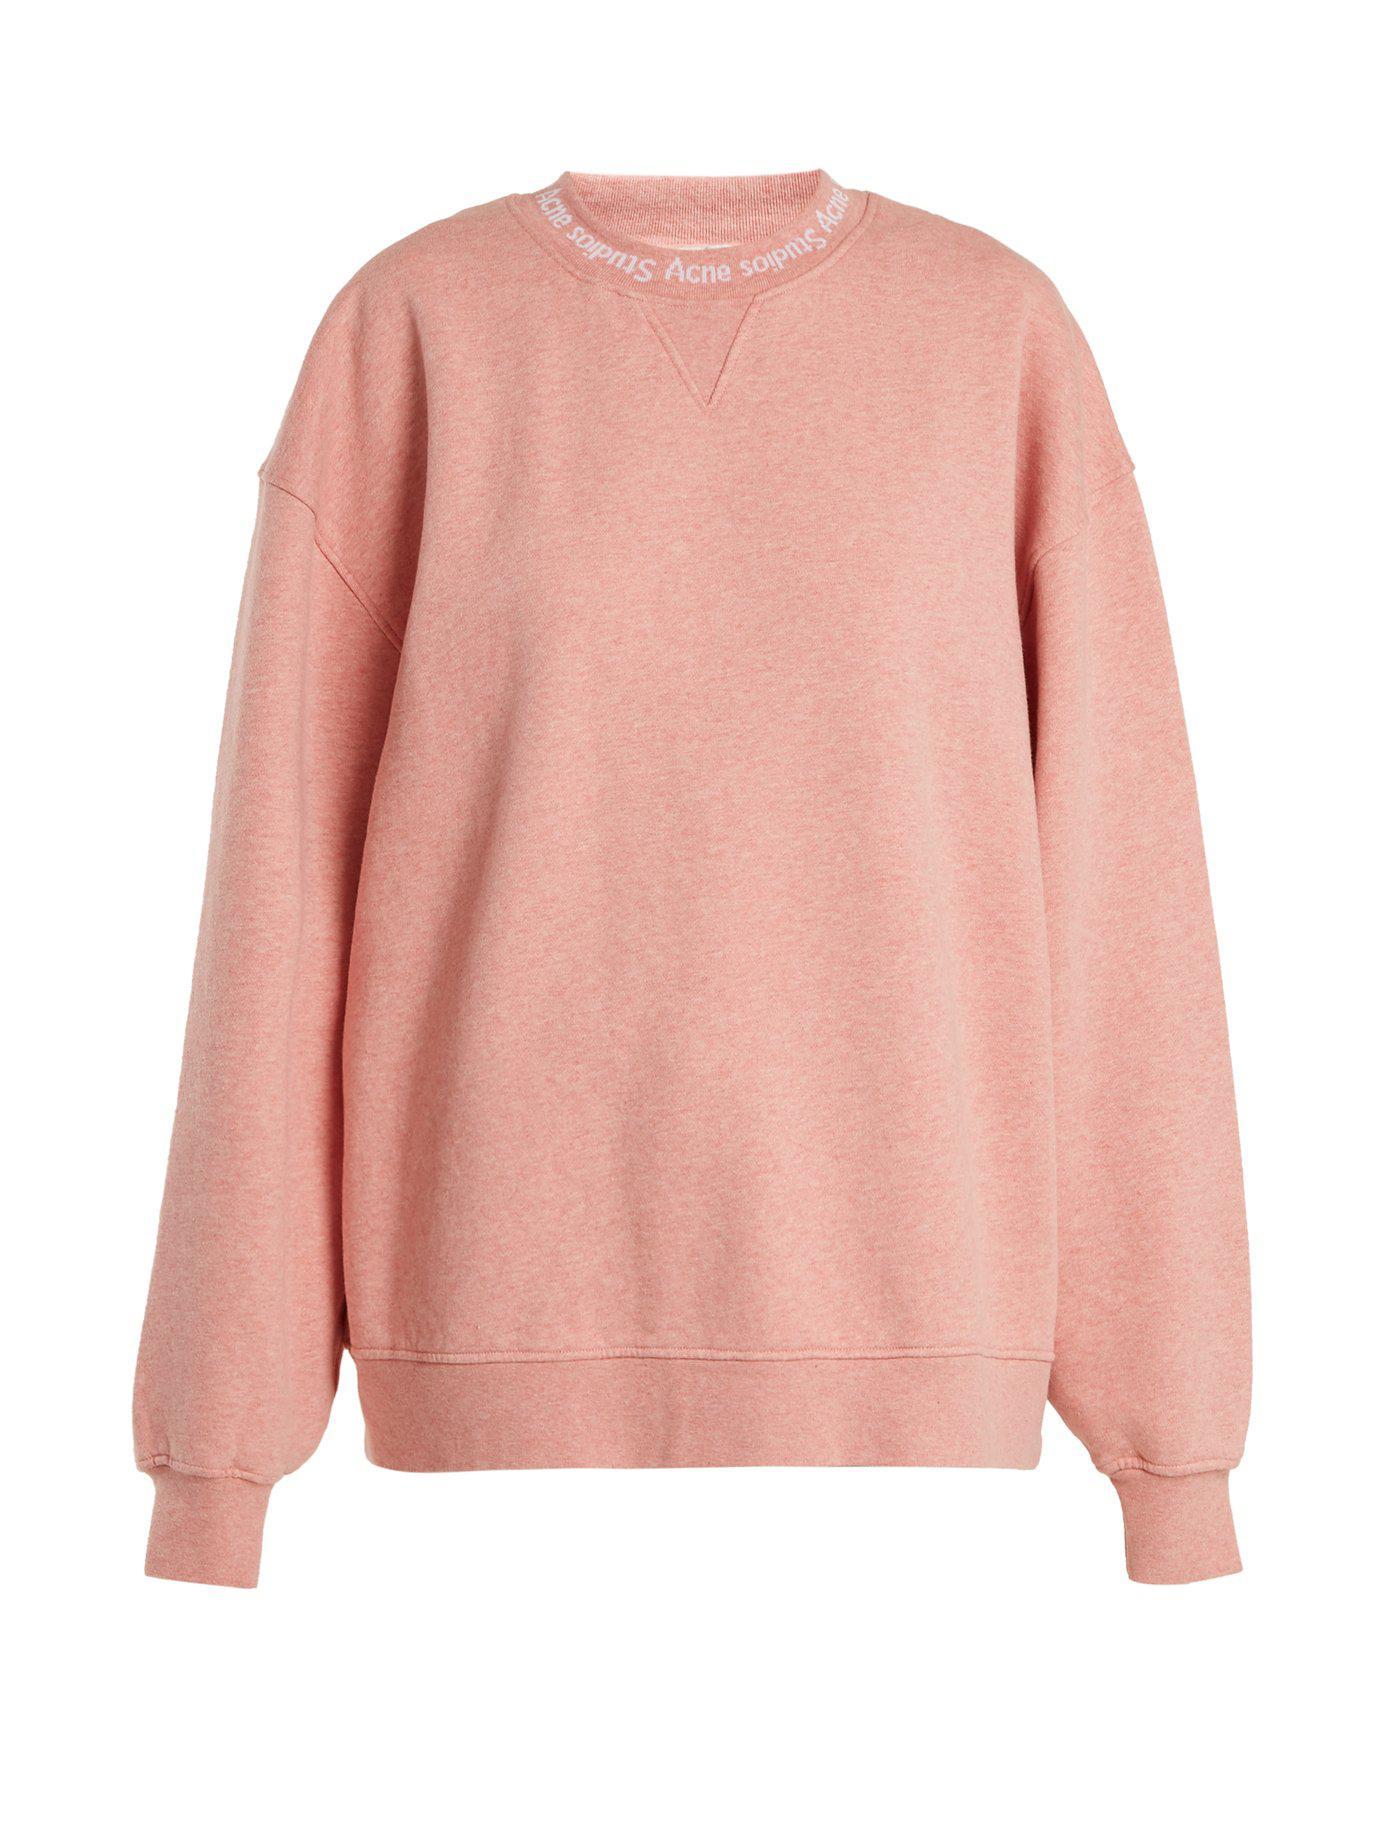 Lyst - Sweat-shirt en coton oversize Yana Acne Studios en coloris Rose 20375fb7a4b